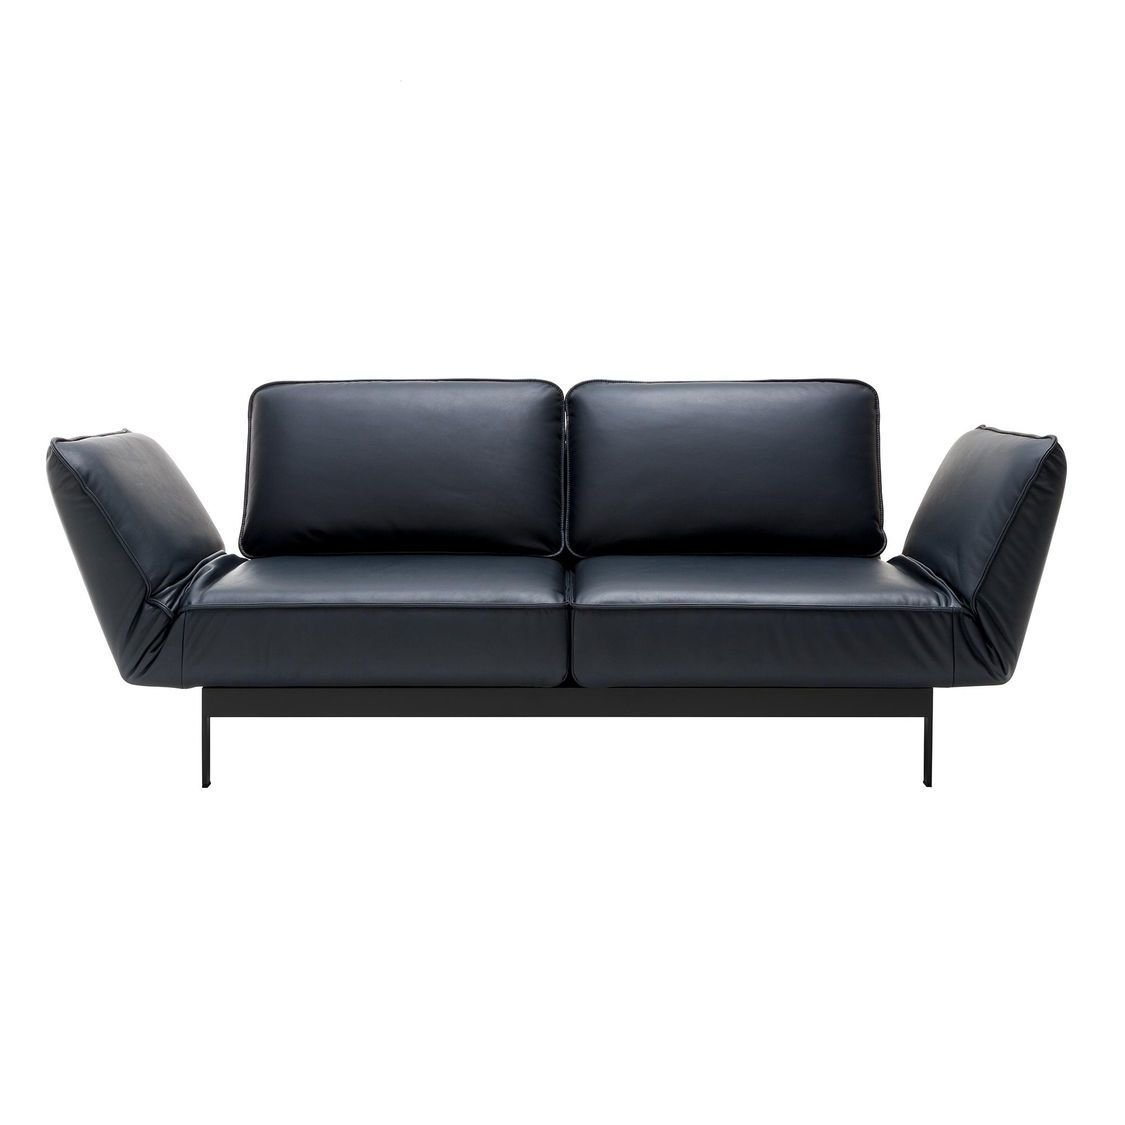 rolf benz 386 mera sofa rolf benz. Black Bedroom Furniture Sets. Home Design Ideas